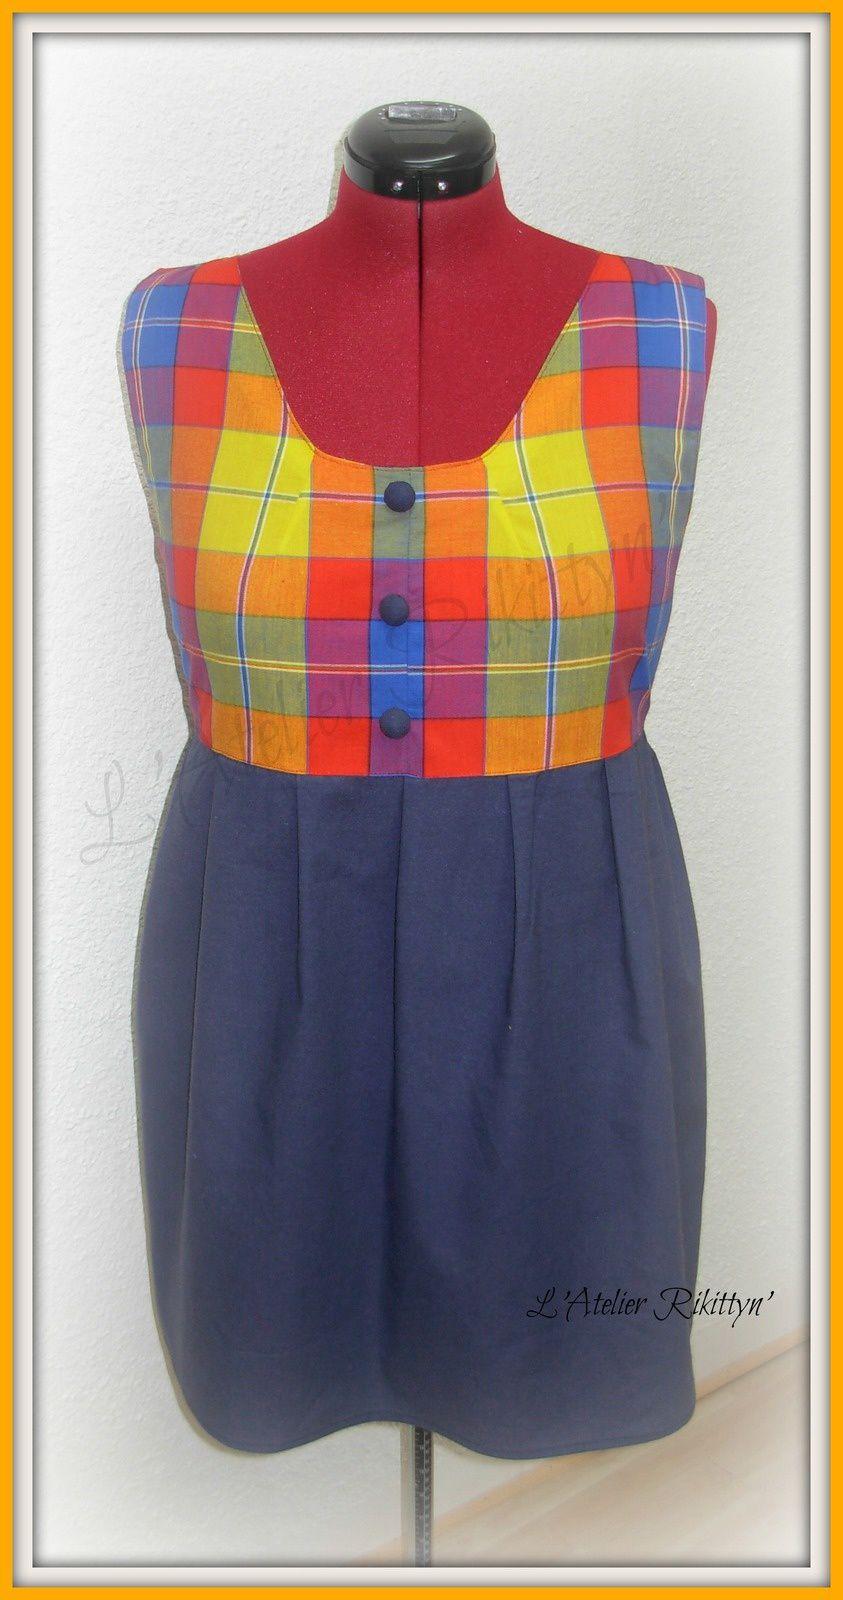 2014.03.17 - Robe bicolore en coton madras et coton uni